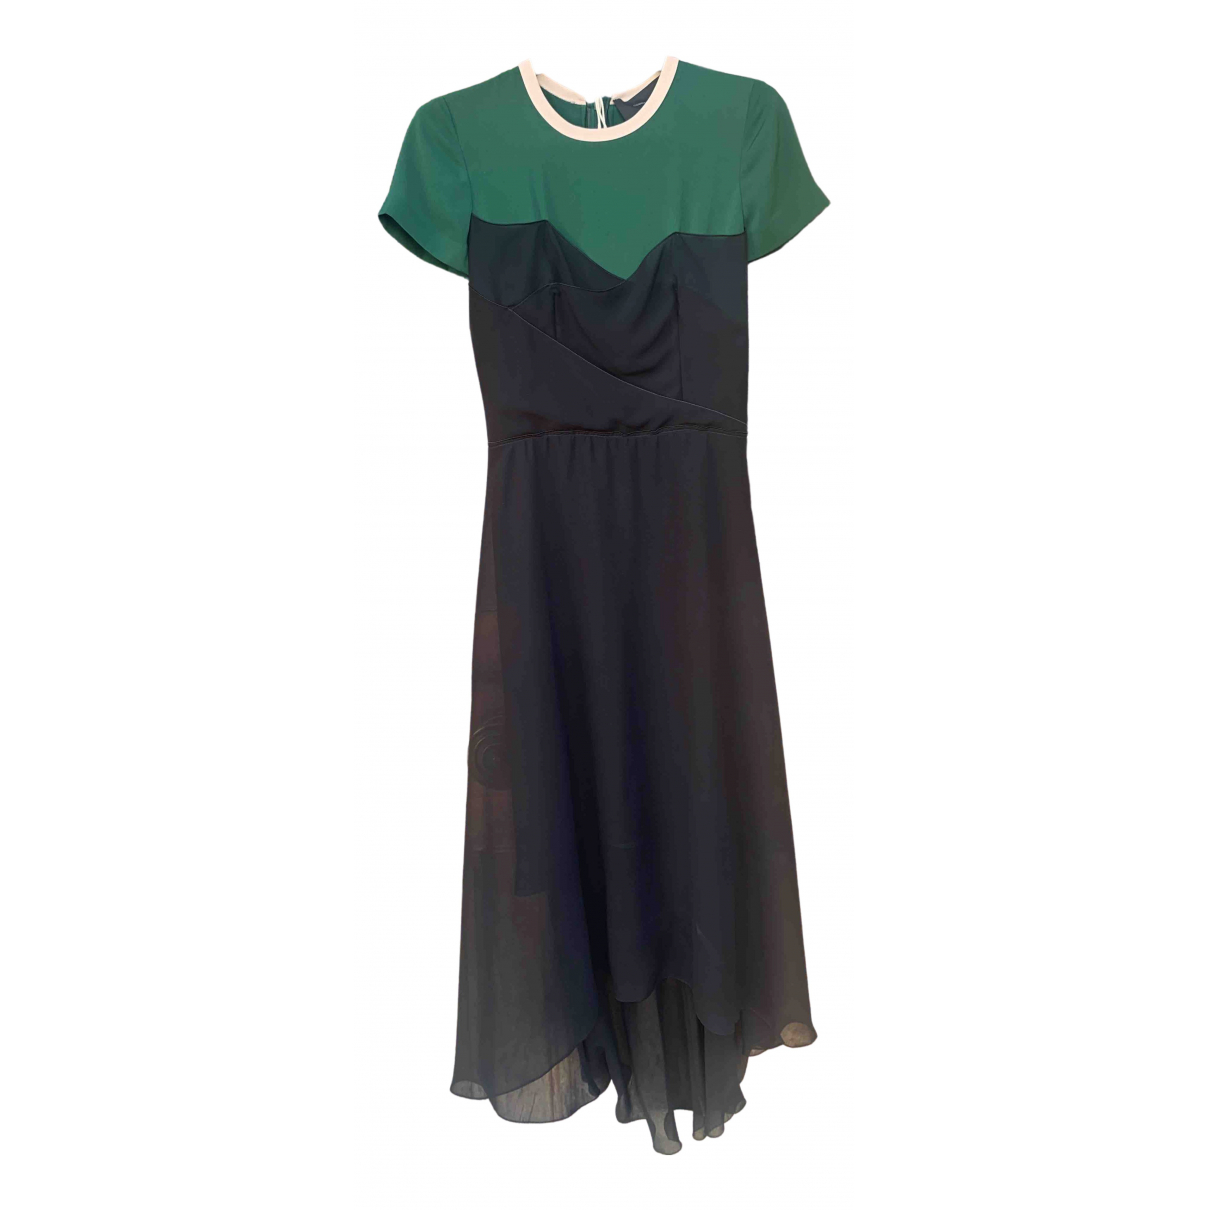 Cedric Charlier \N Kleid in  Gruen Polyester